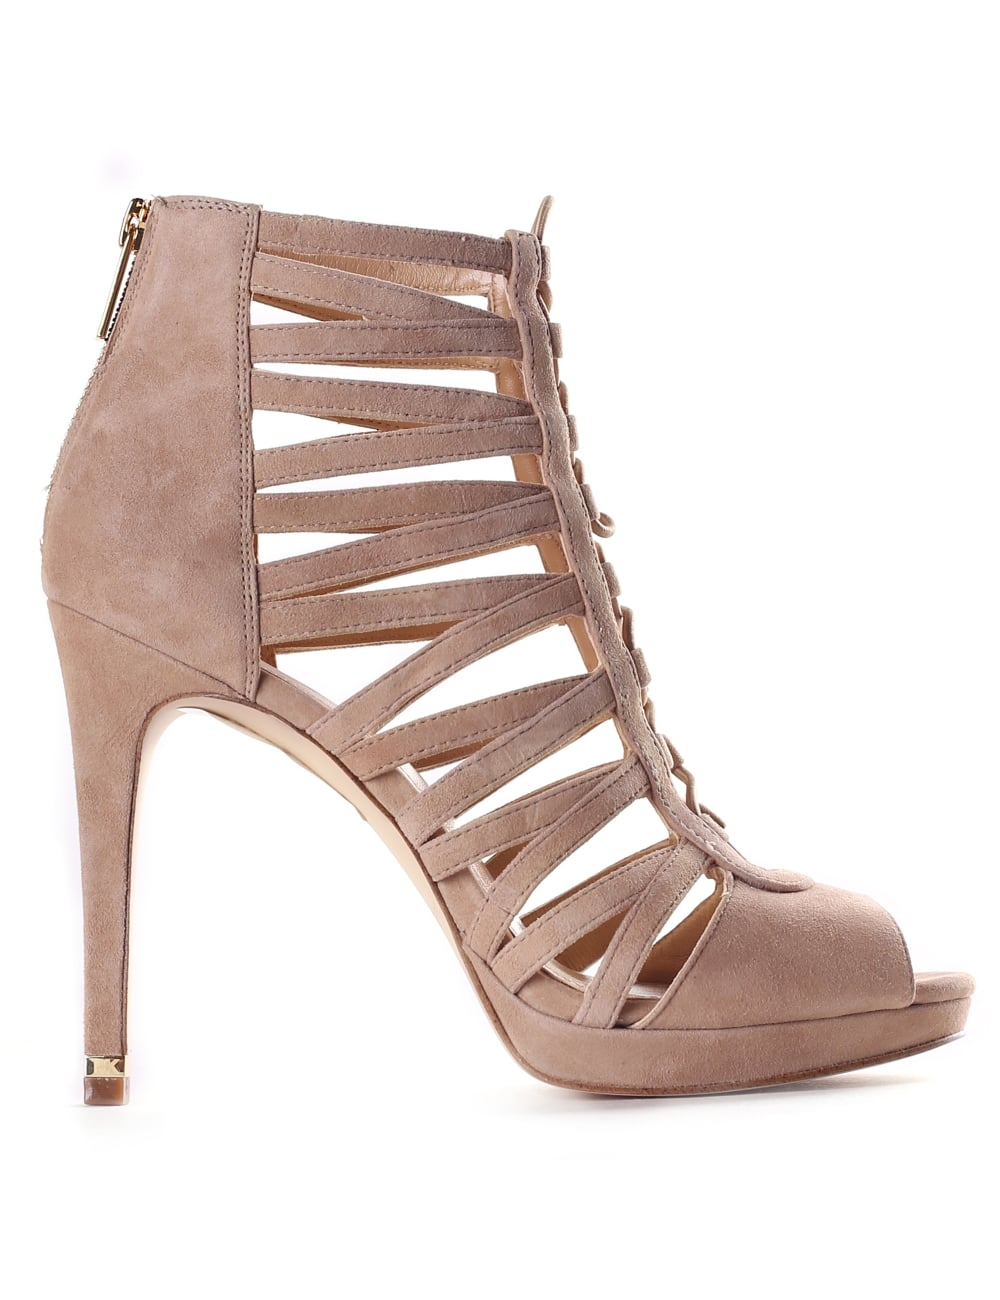 43b16b12667 Michael Kors Women's Clarissa Platform Heels